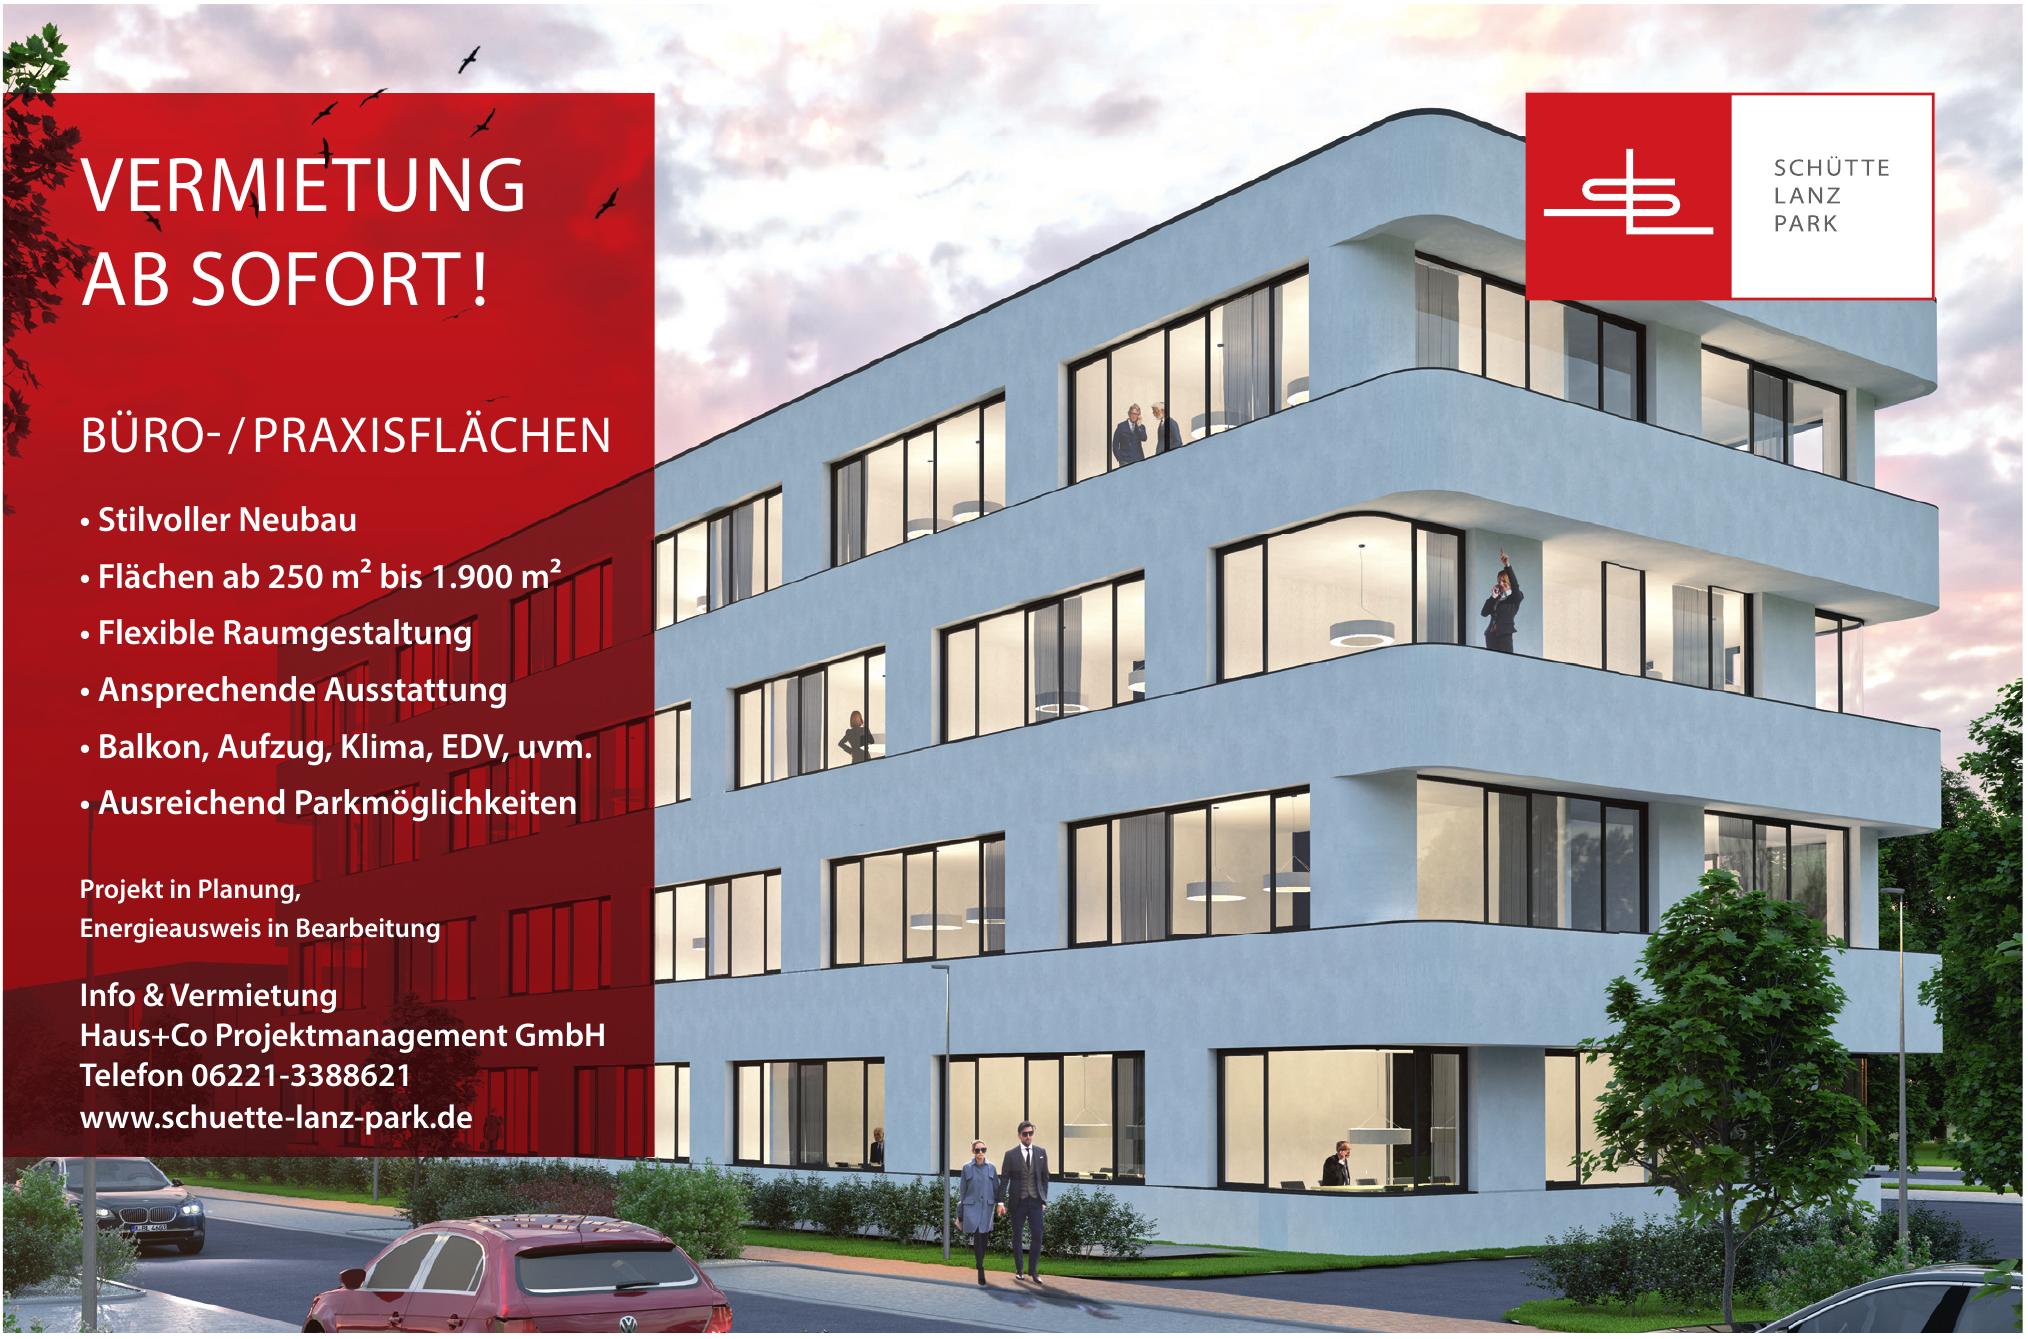 Haus+Co Projektmanagement GmbH